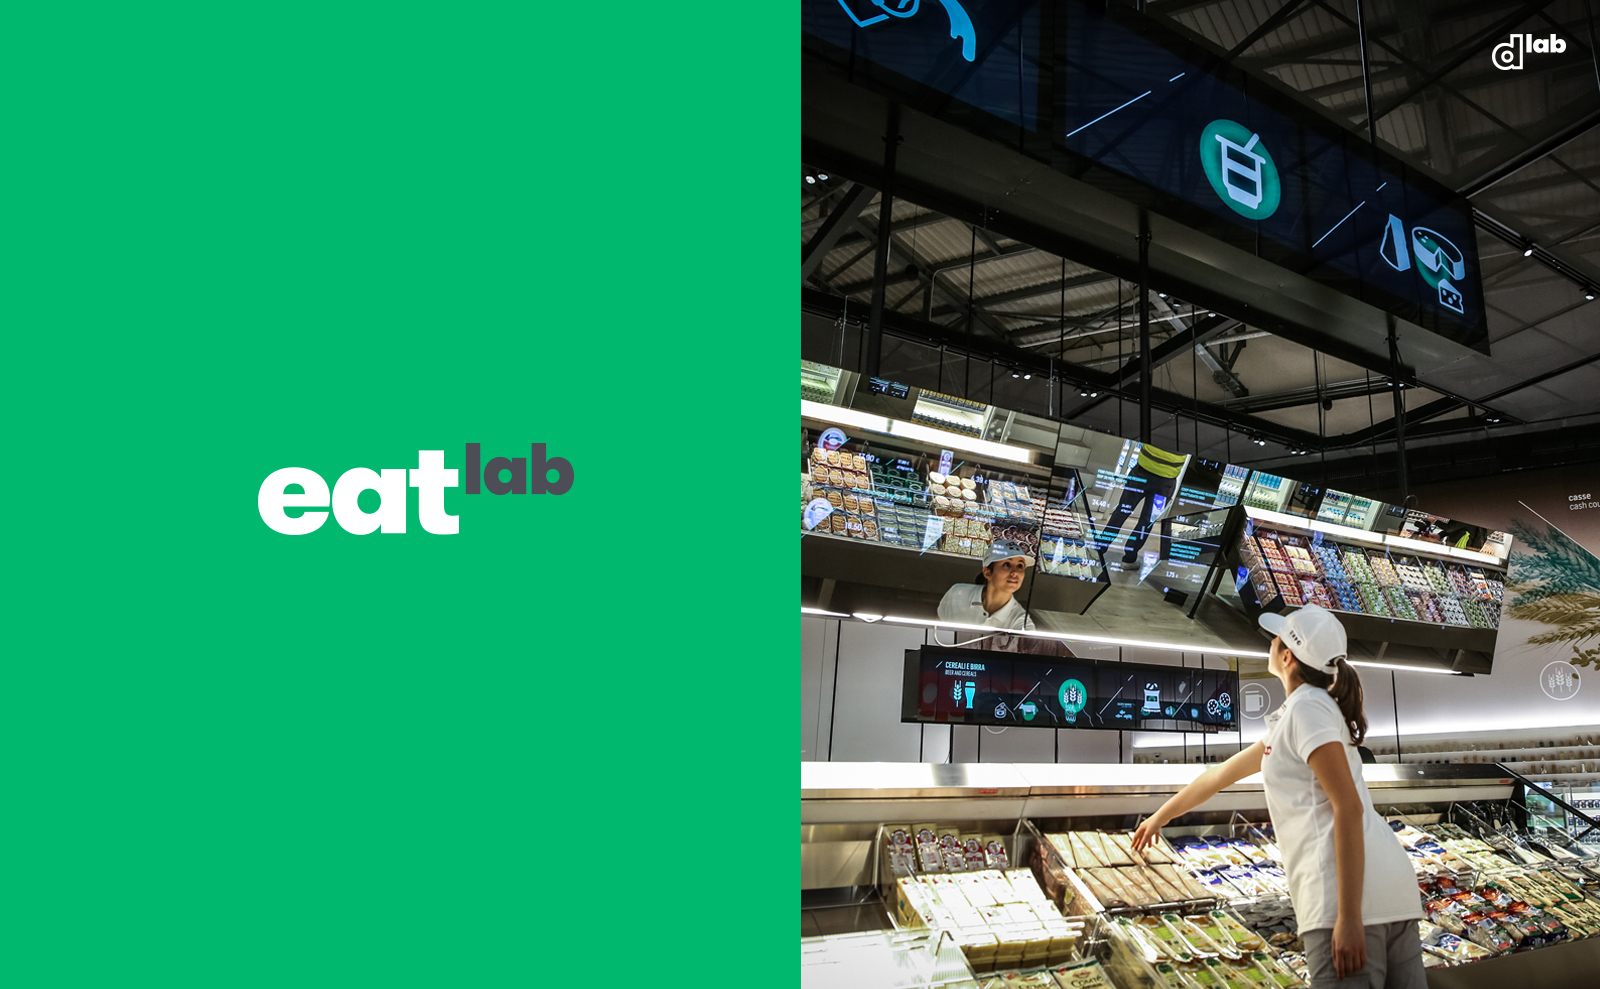 EatLab for Amazon DreamLab